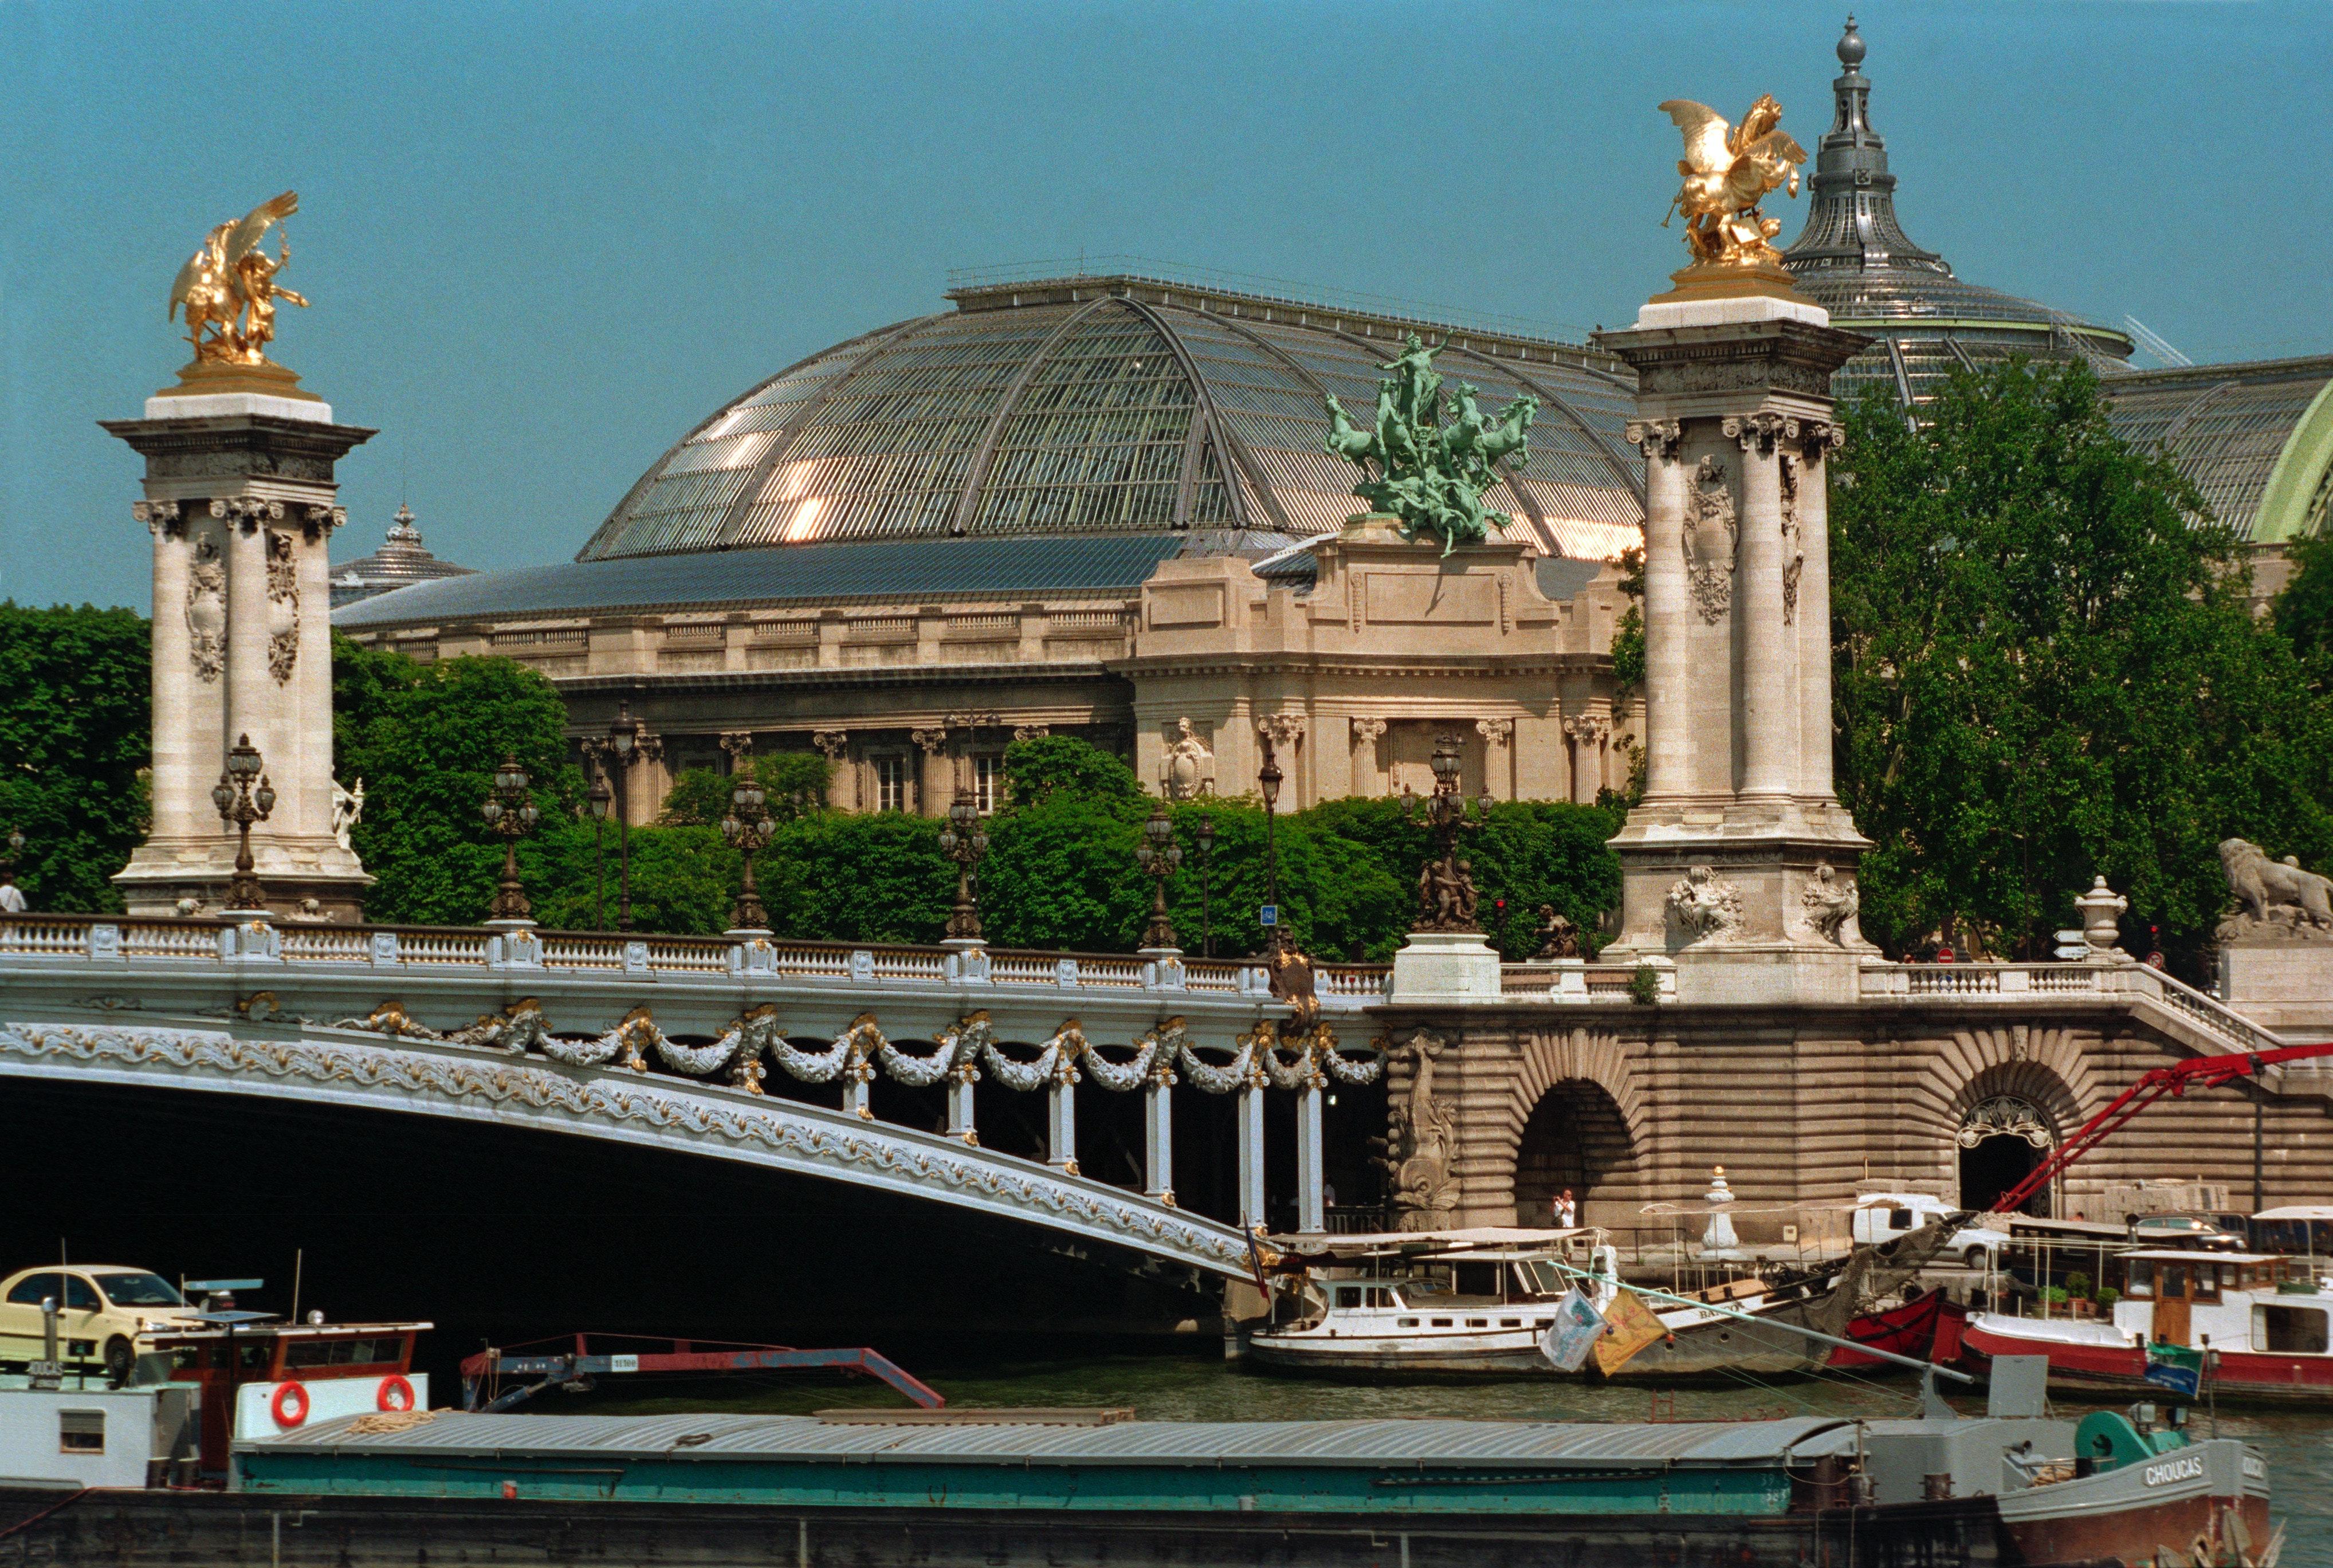 Grand Palais, Champs Elysees